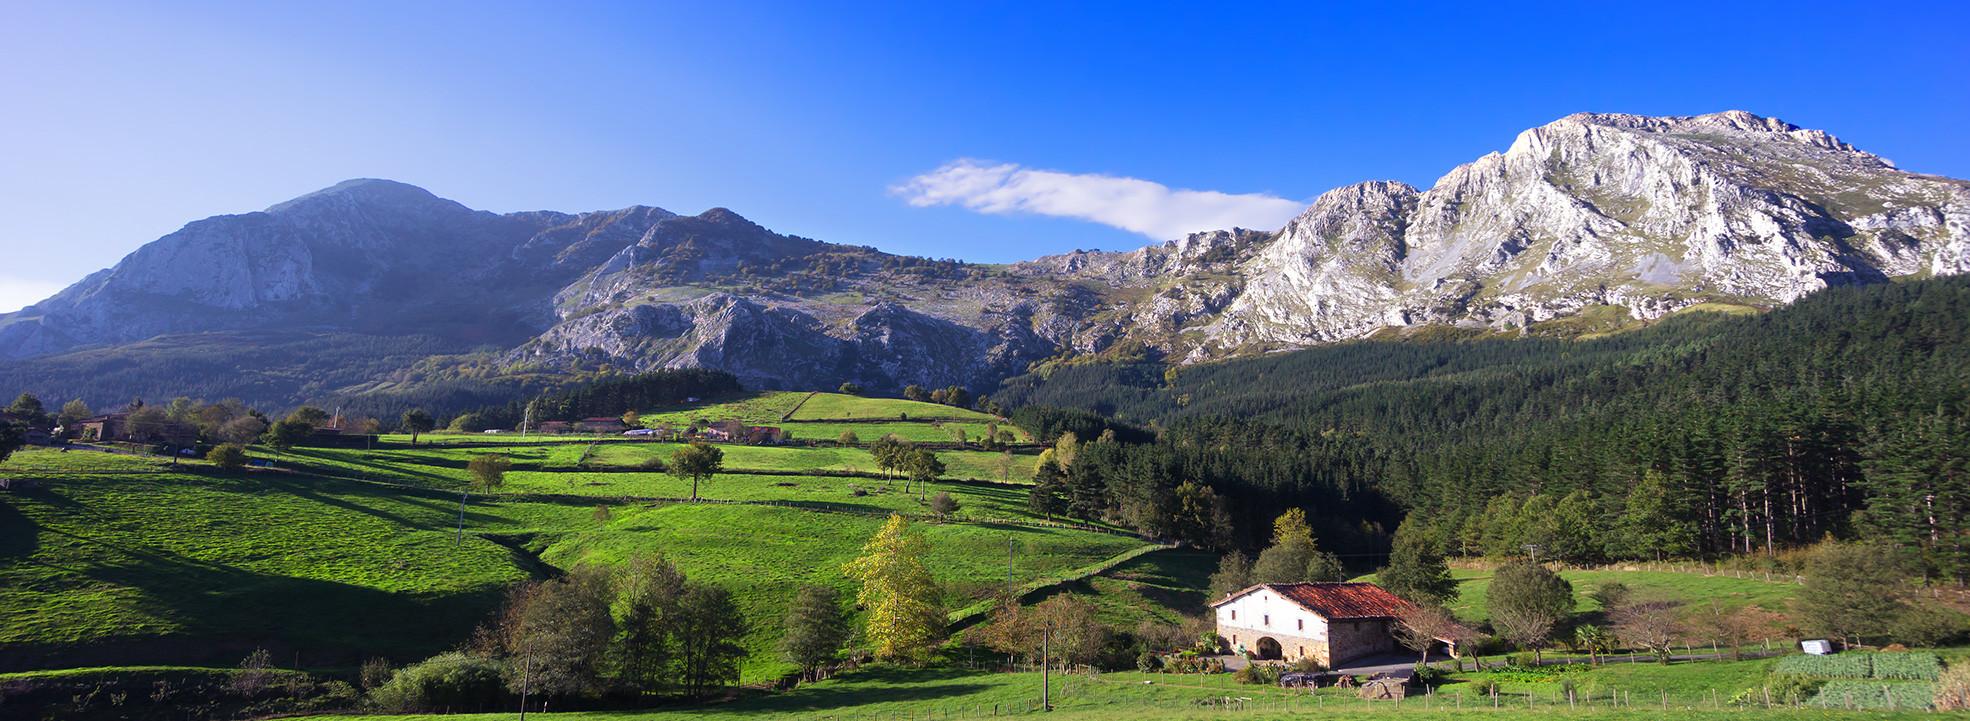 Magnificent landscapes for our Basque mountains